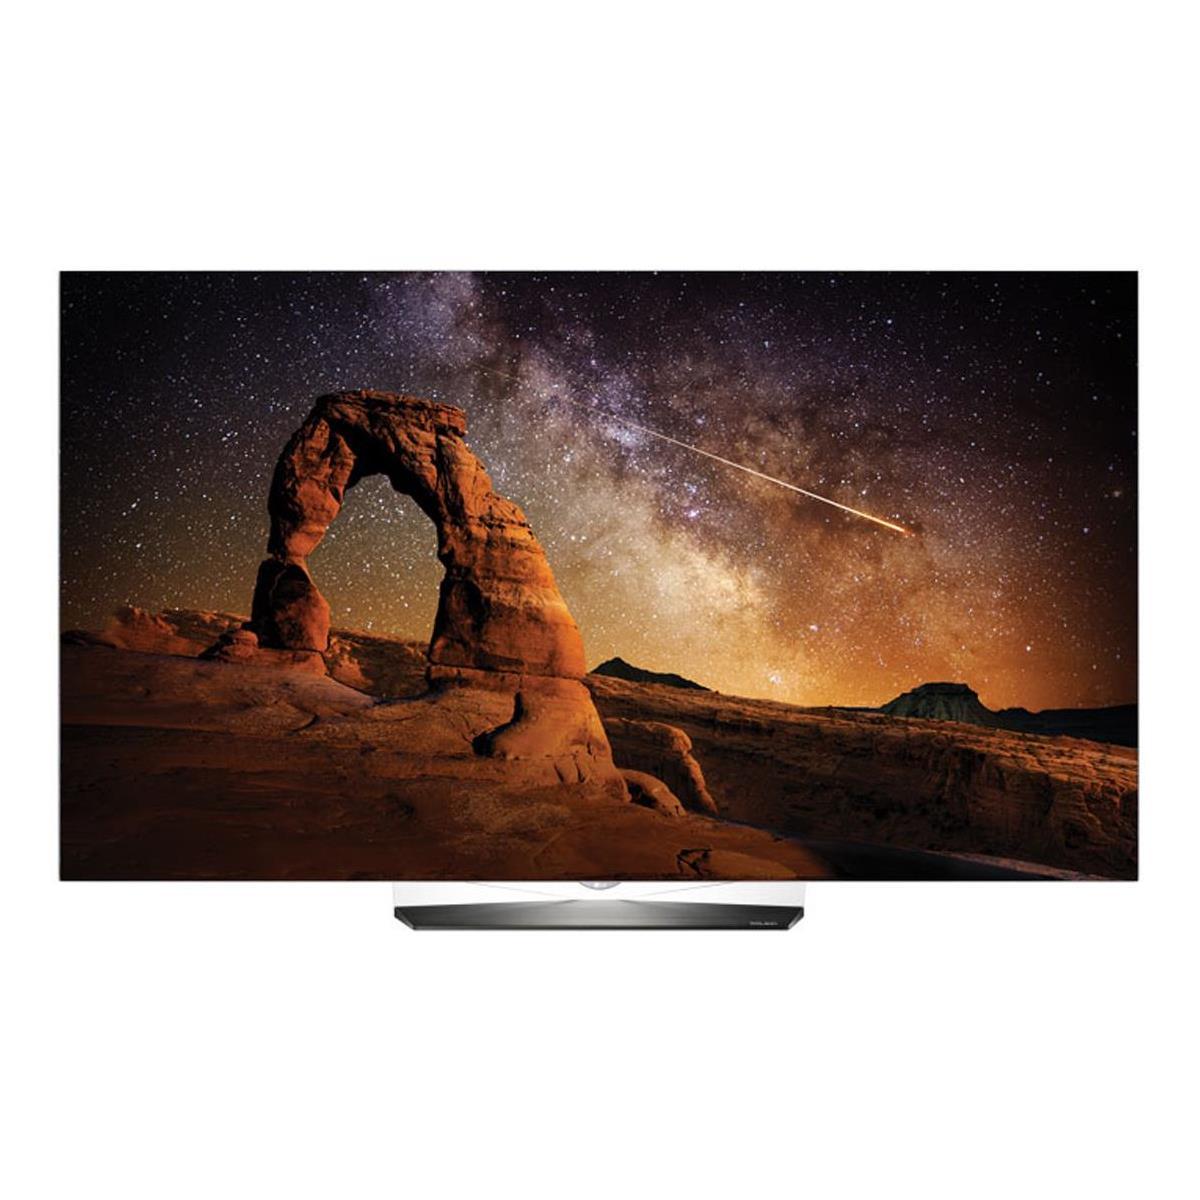 "*live* LG OLED HDTV'S:55"" OLED55B6P or OLED55C6P (flat/curved) $1499 or OLED55E6P (flat w/ 3D + Soundbar) $1799 + Free Shipping"